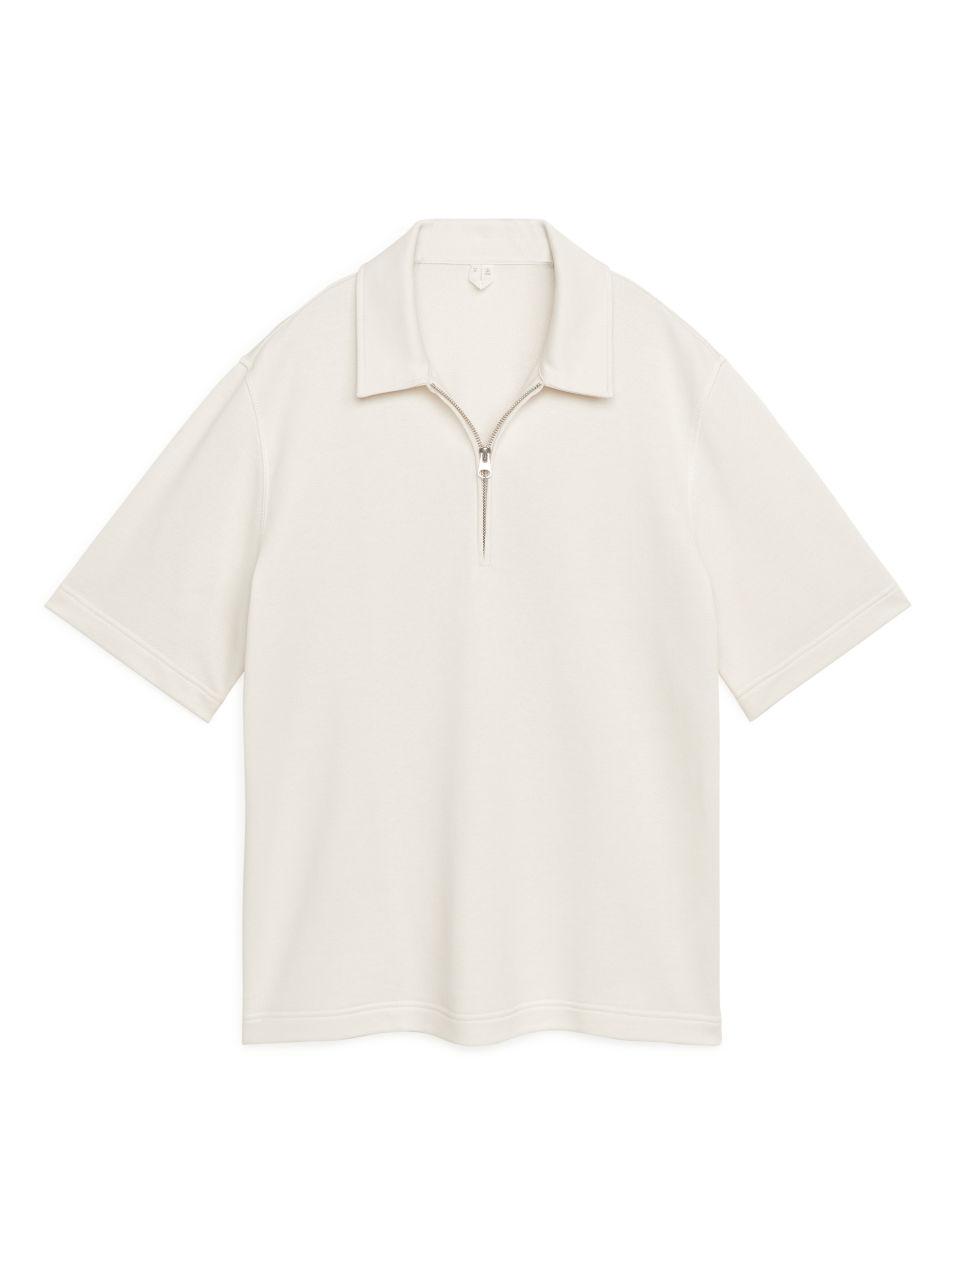 Zipped Polo Shirt - White